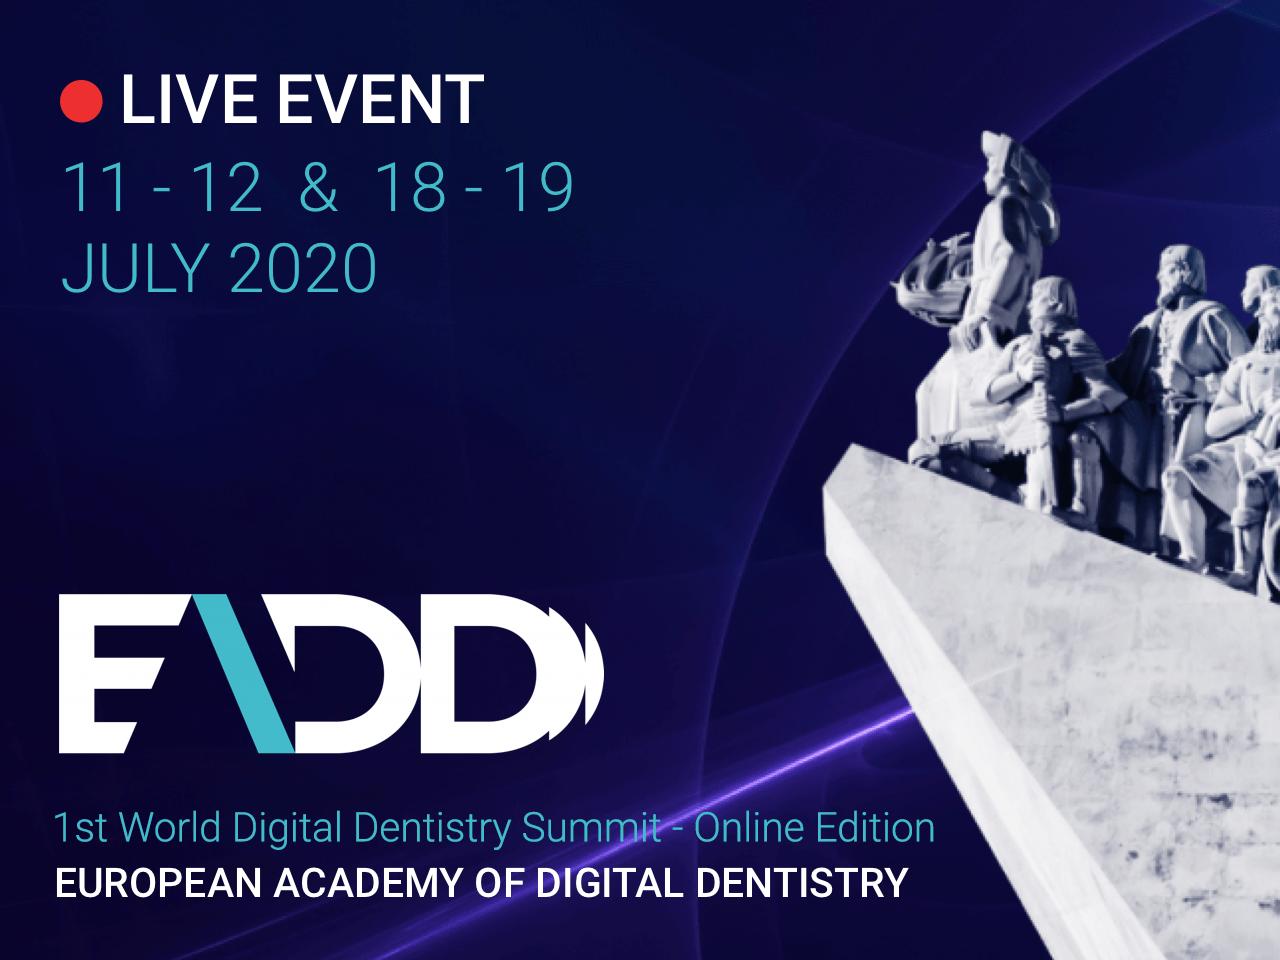 2020 EADD Congress | 1st World Digital Dentistry Summit